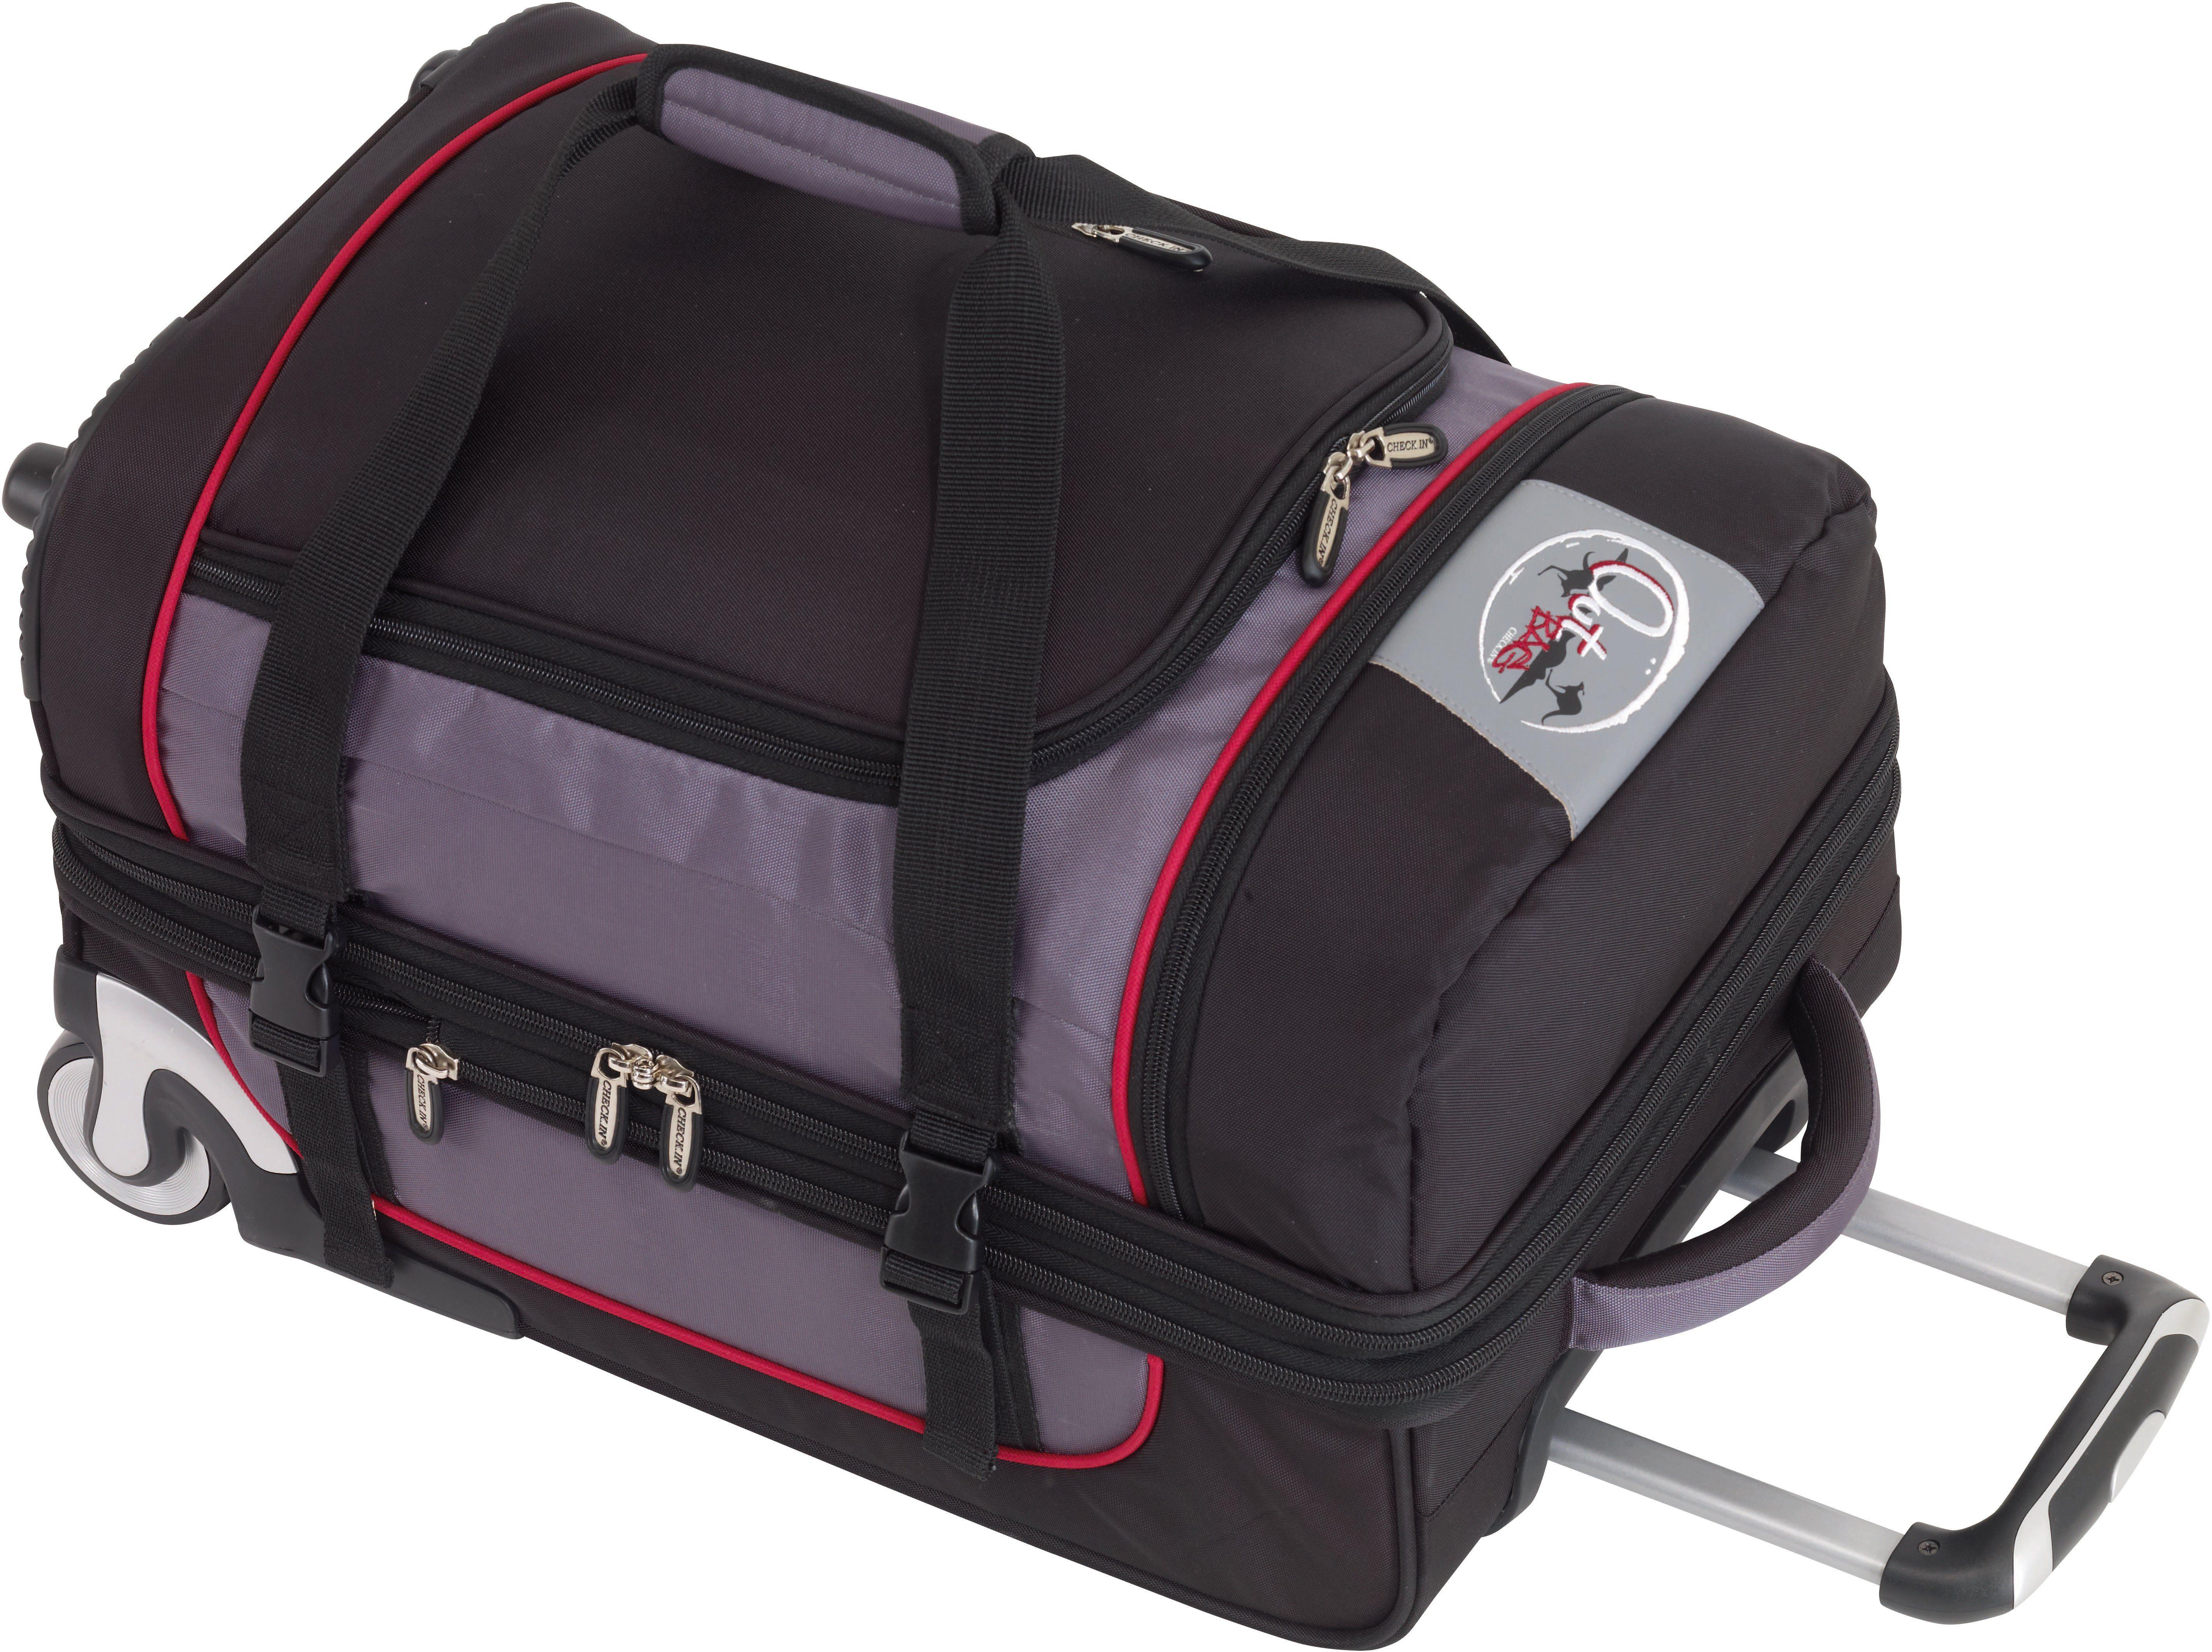 OutBAG Trolley-Reisetasche mit 2 Rollen, »OutBAG SPORTS S, schwarz/rot«